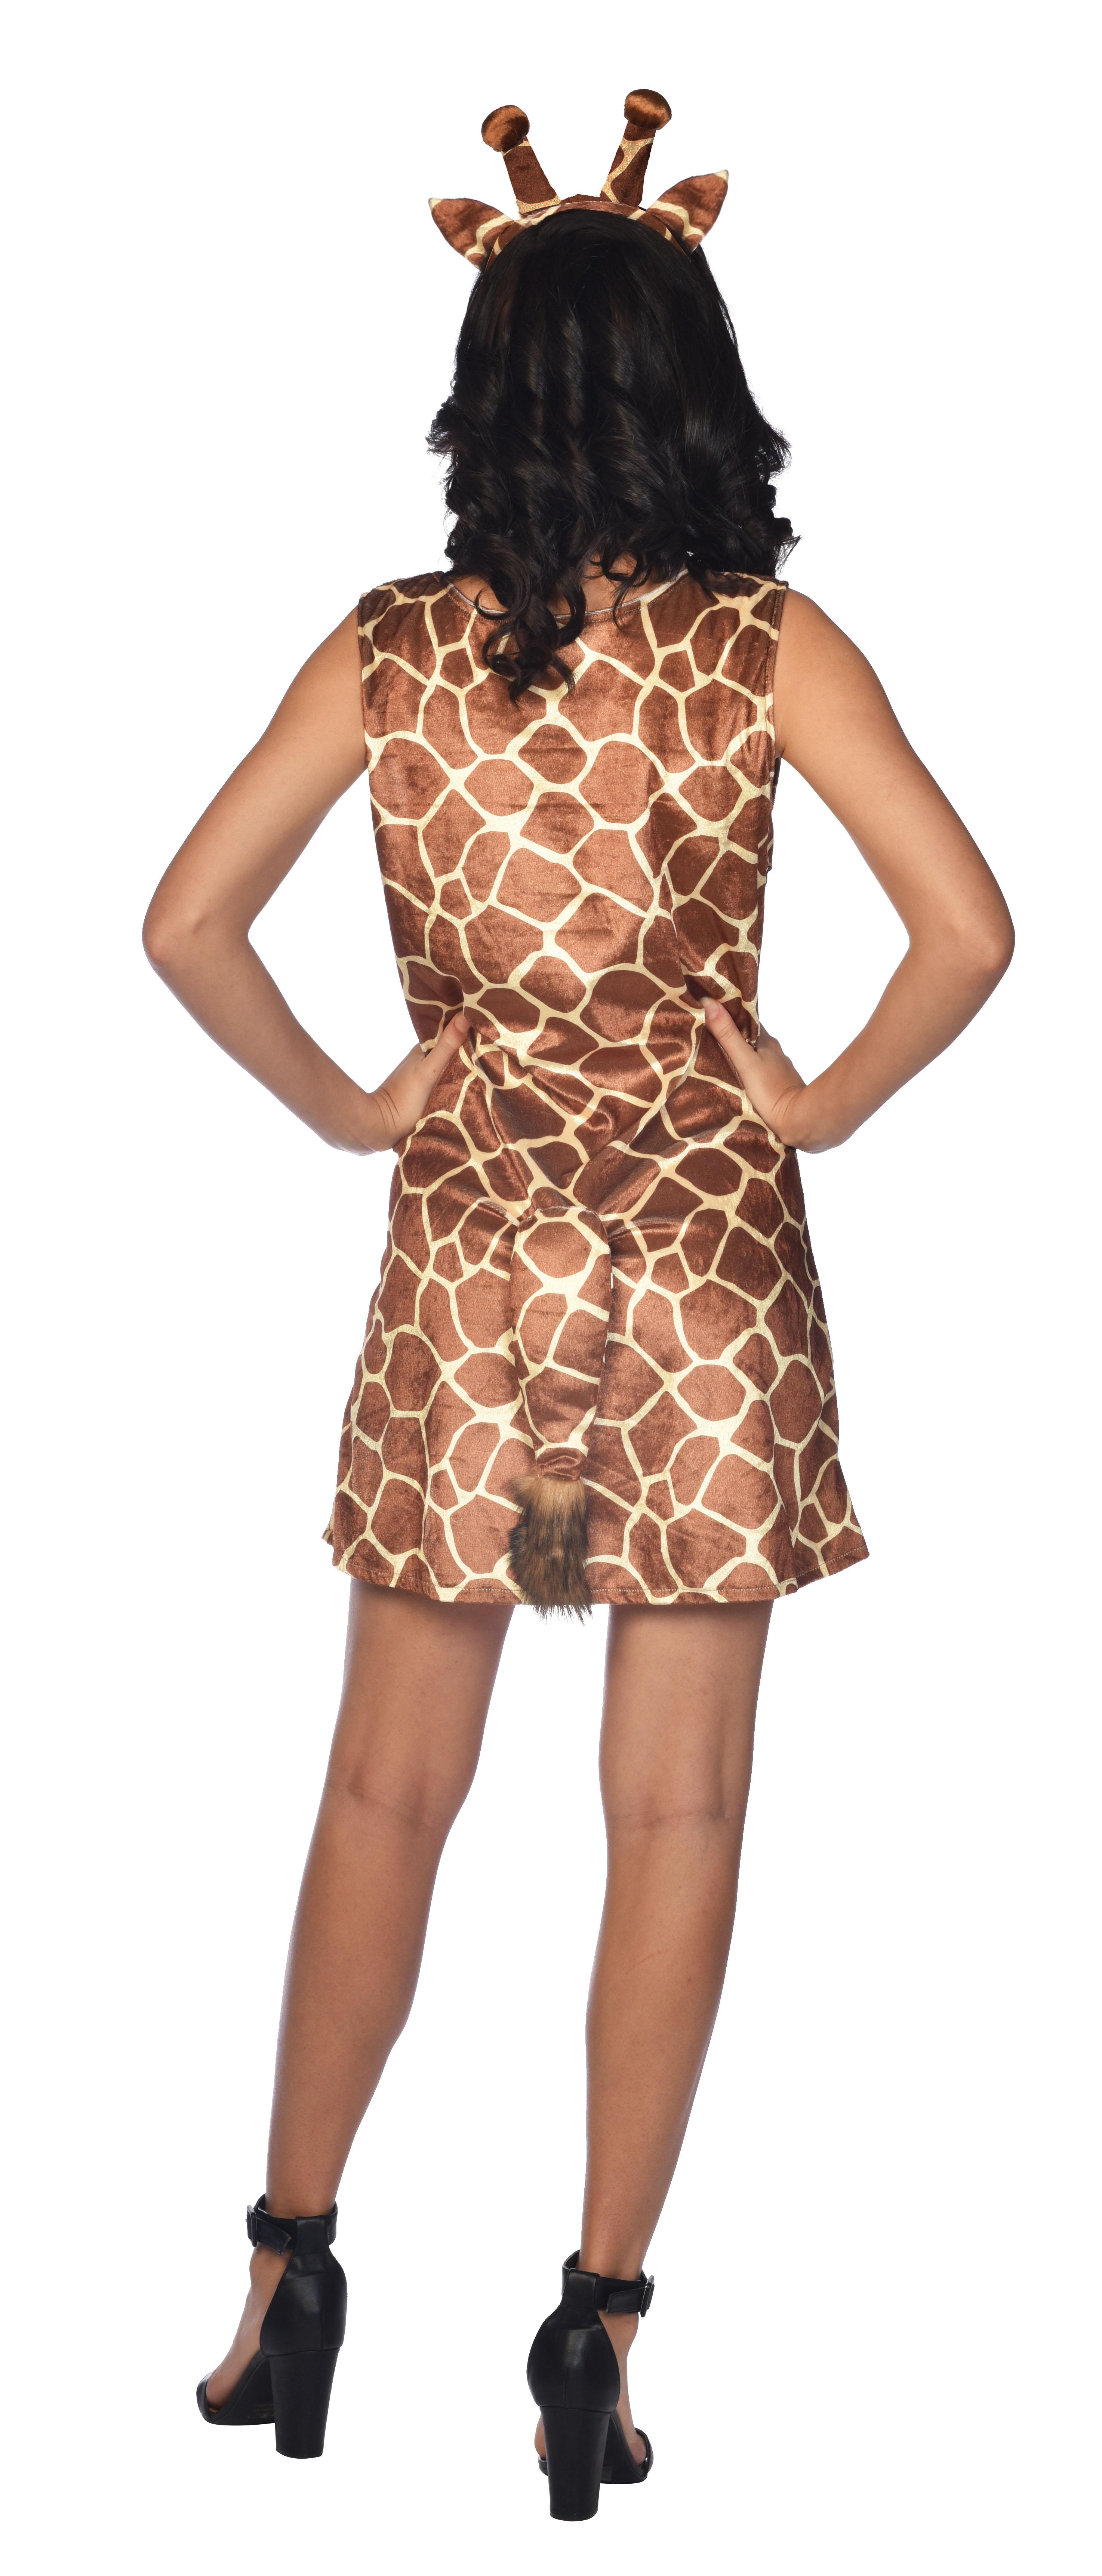 Indexbild 19 - Adult Ladies Zoo Safari Animal Giraffe Lady Fancy Dress Costume Womens Outfit